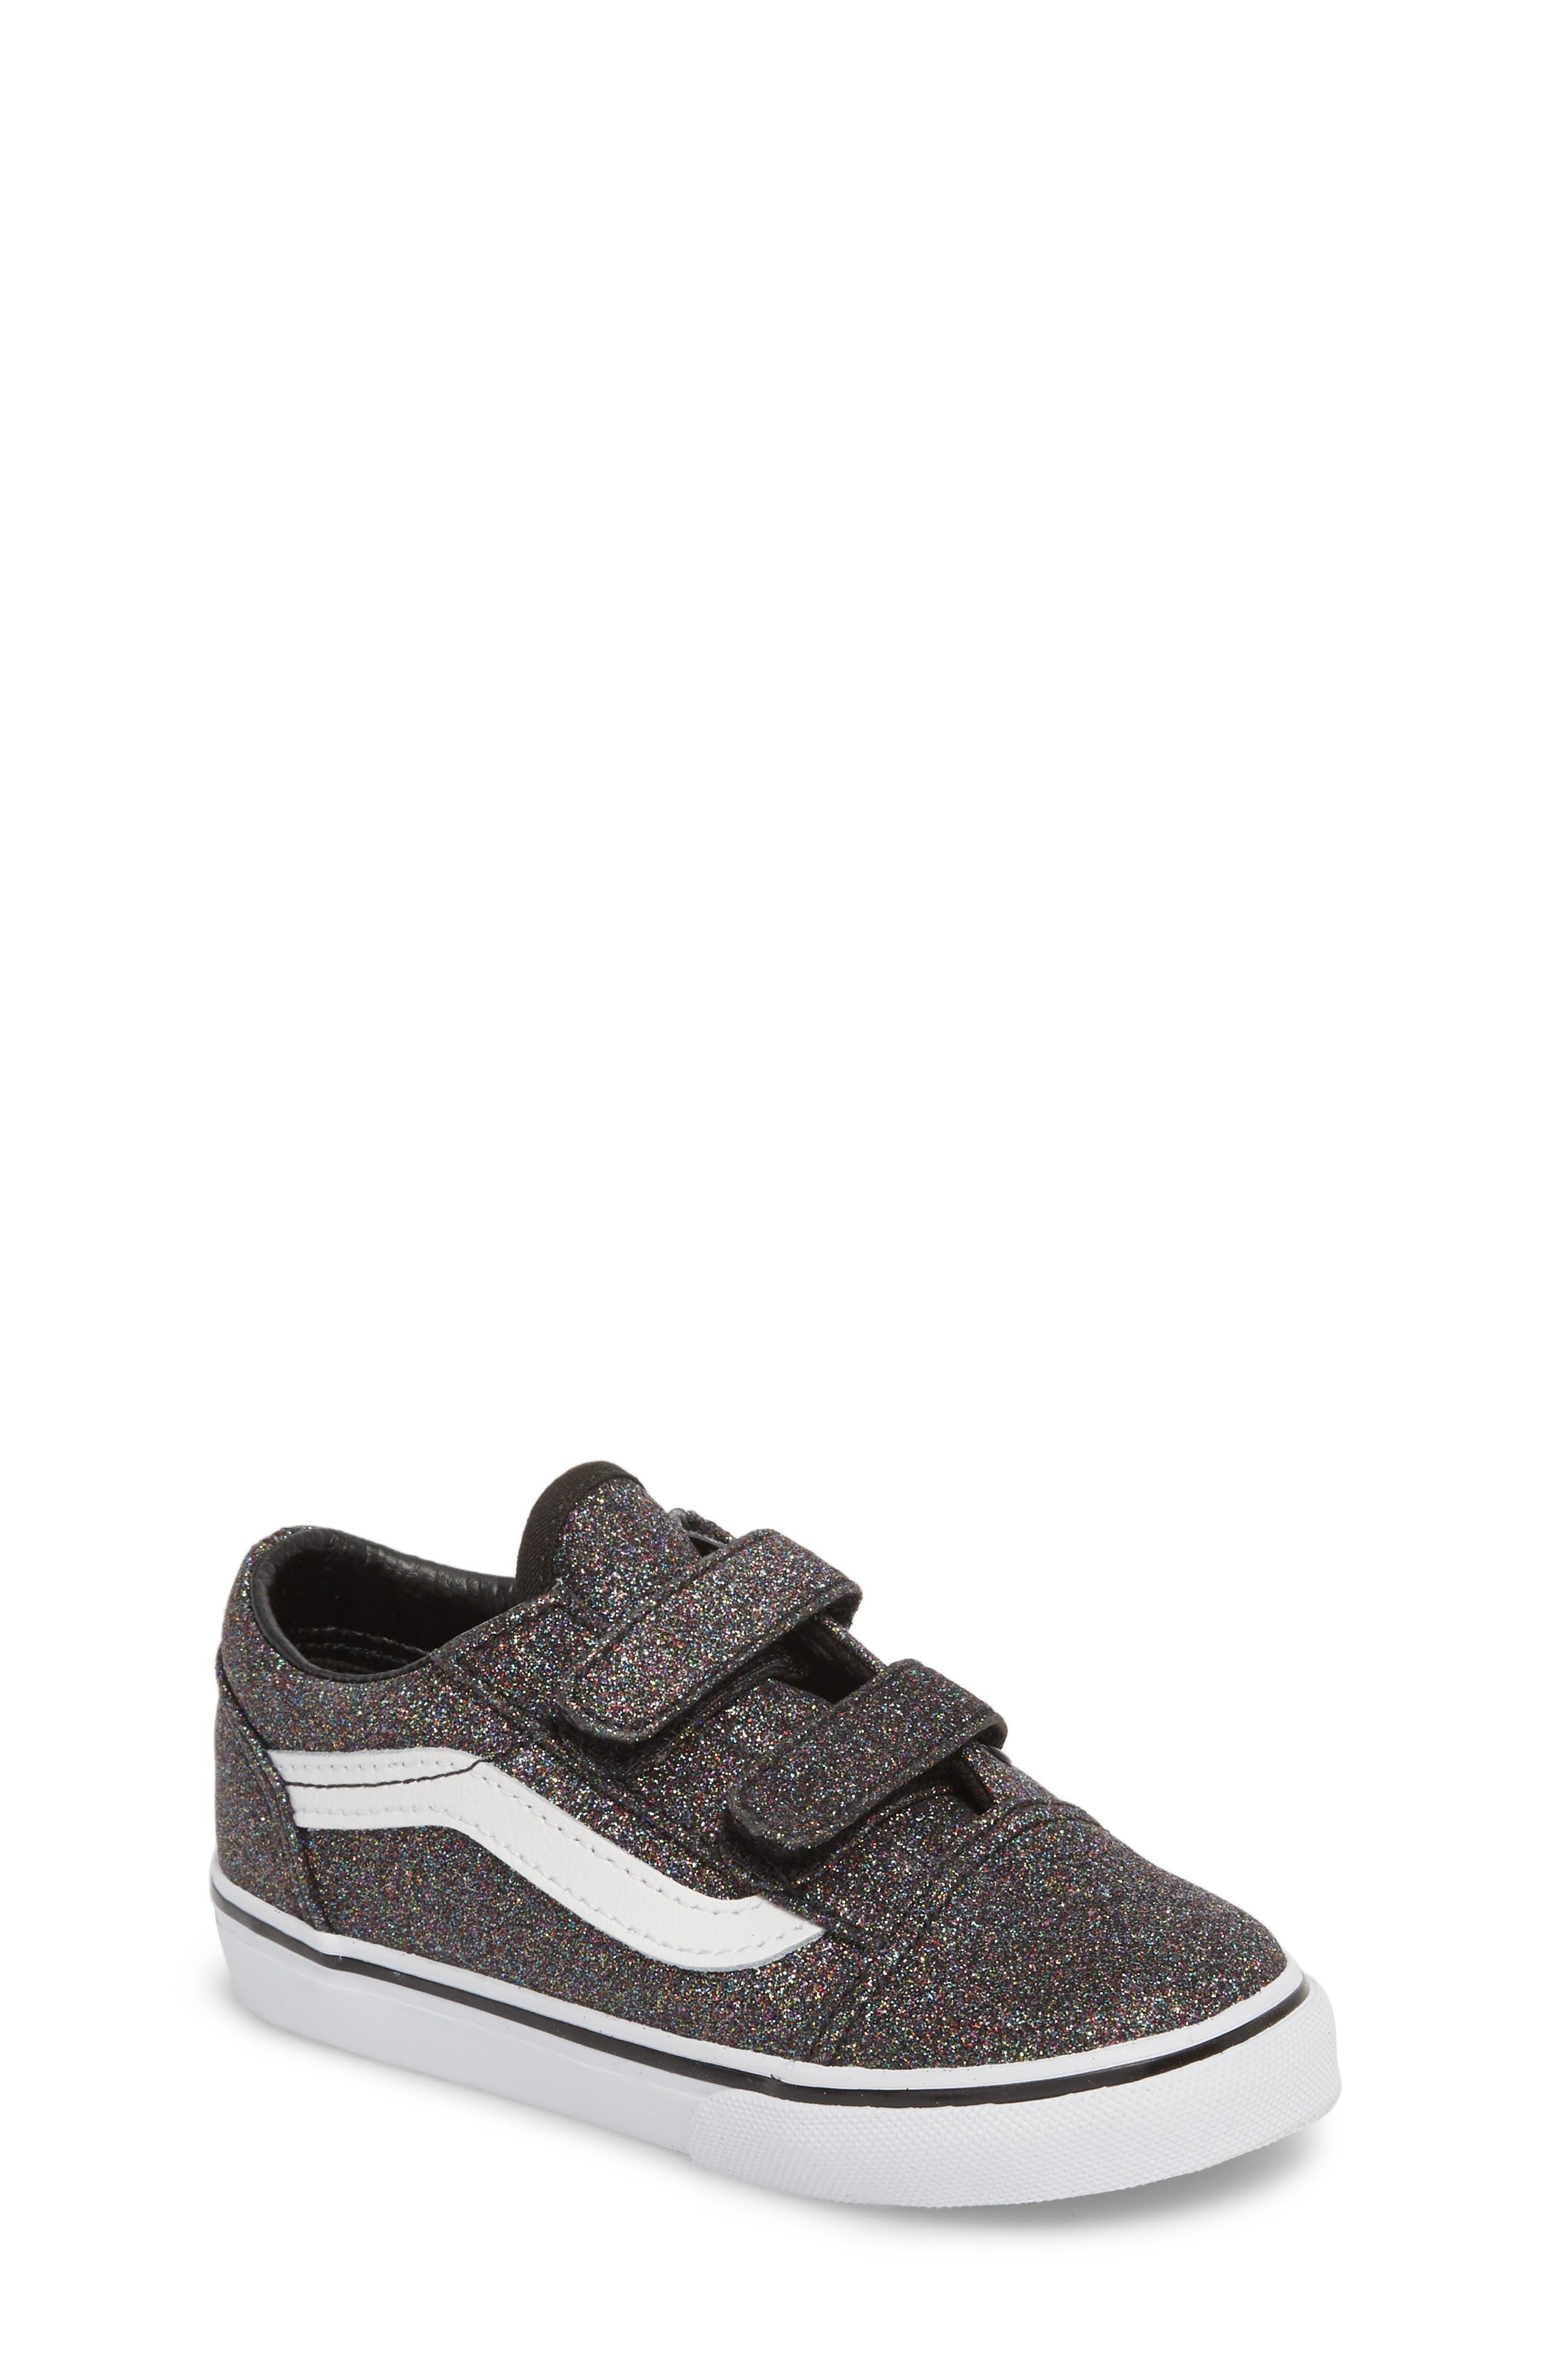 Old Skool V Glitter Sneaker,                         Main,                         color, 001